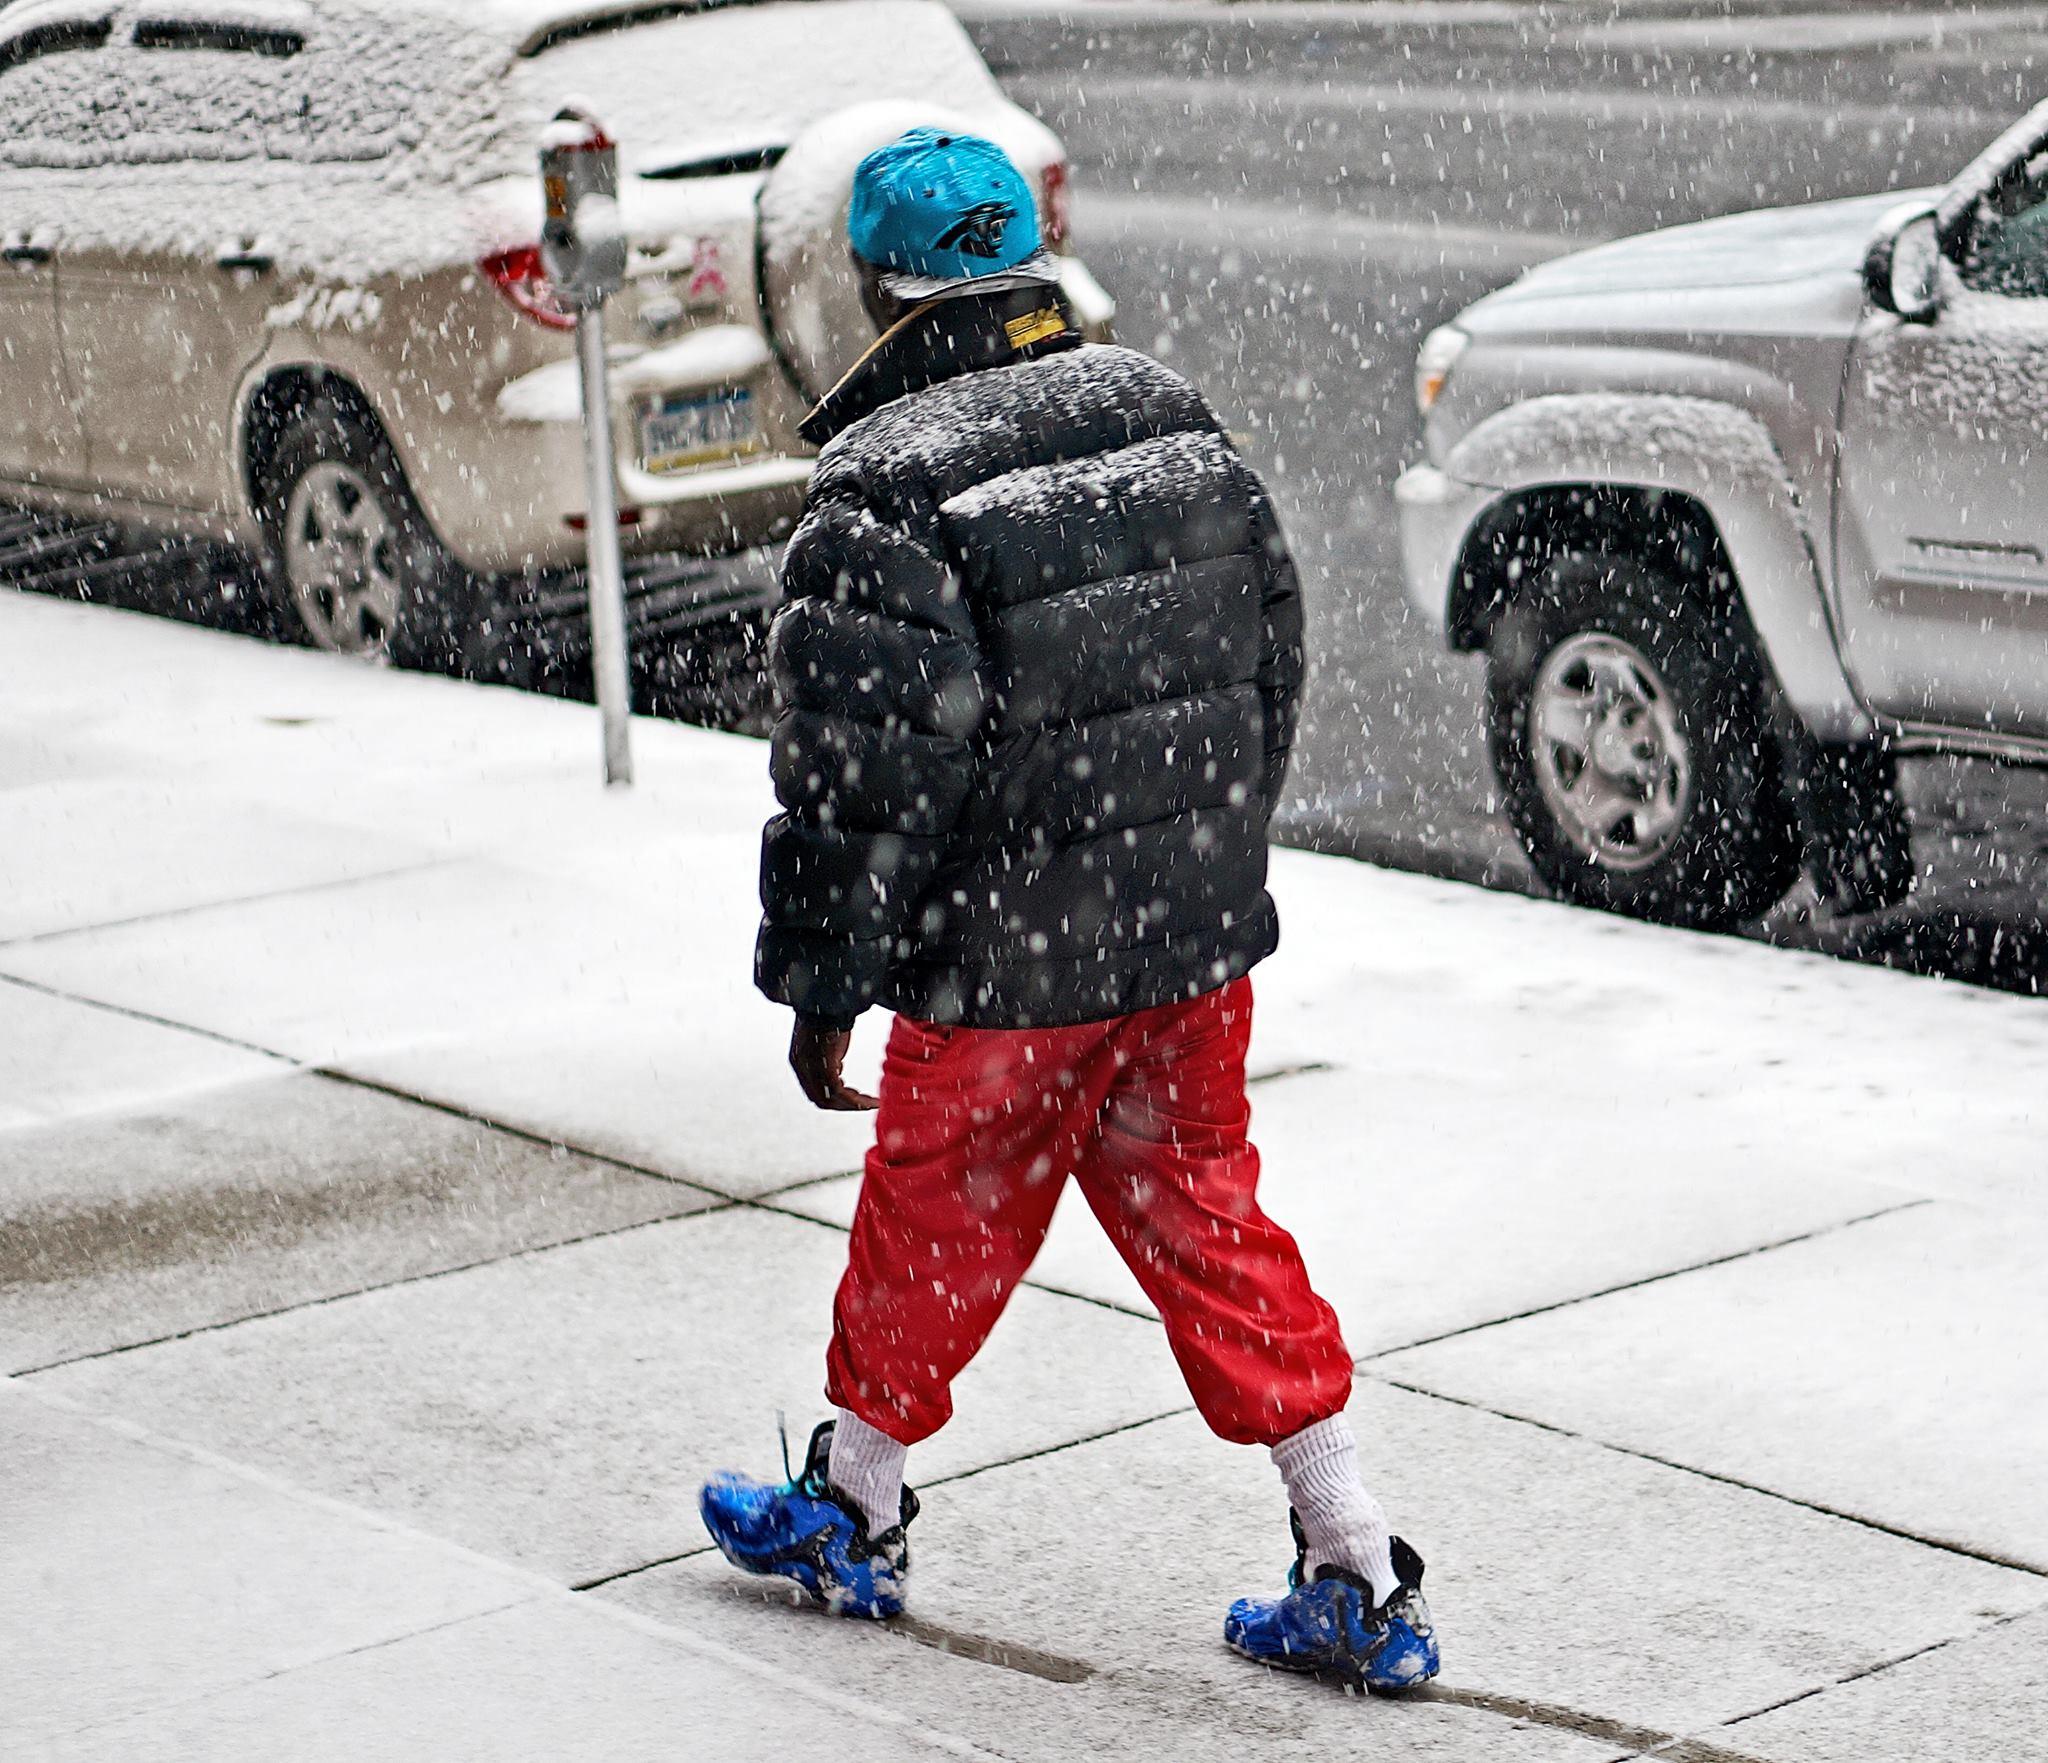 Snowy shuffle